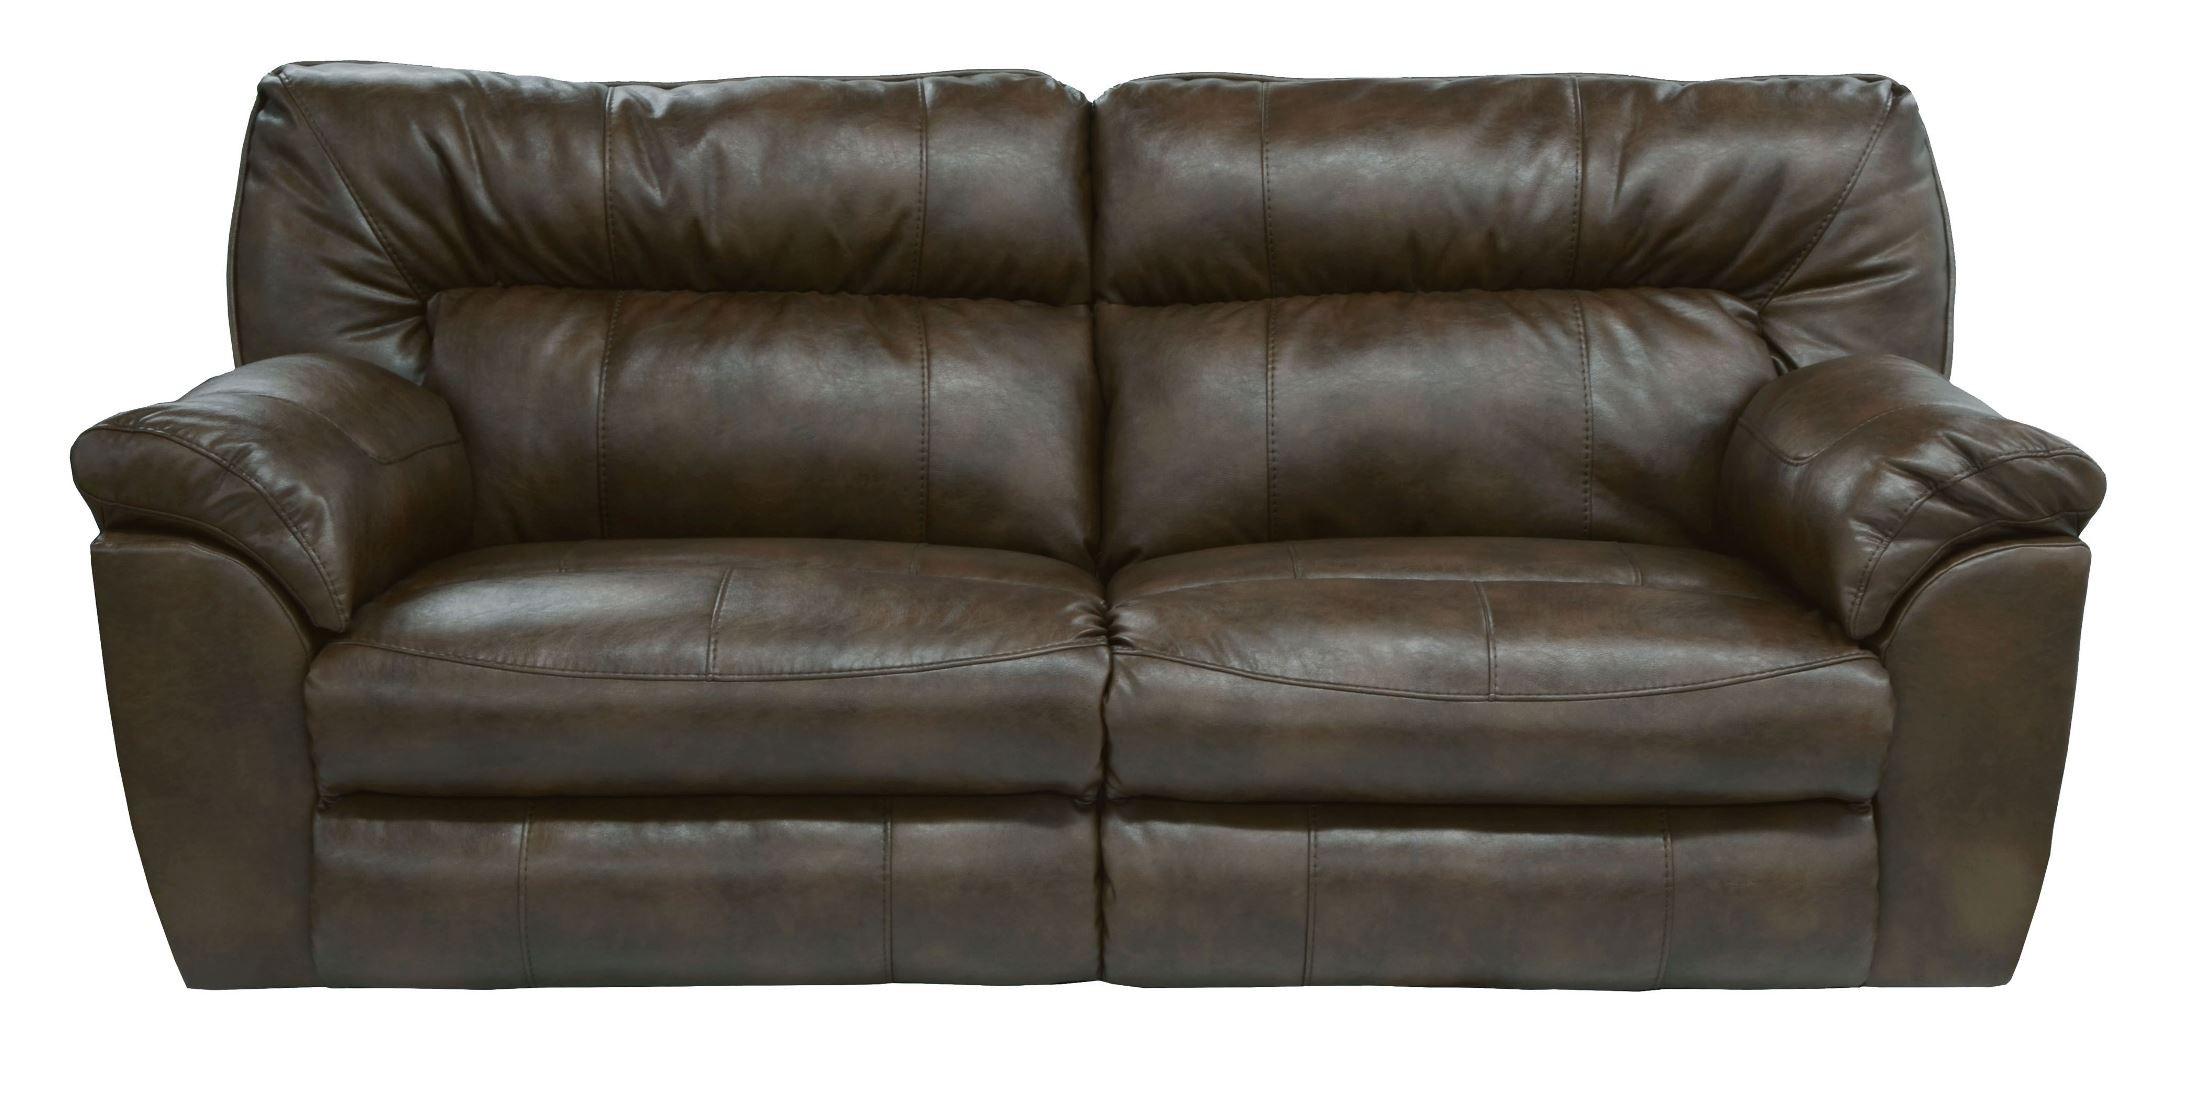 nolan power reclining sofa chesterfield settee godiva from catnapper